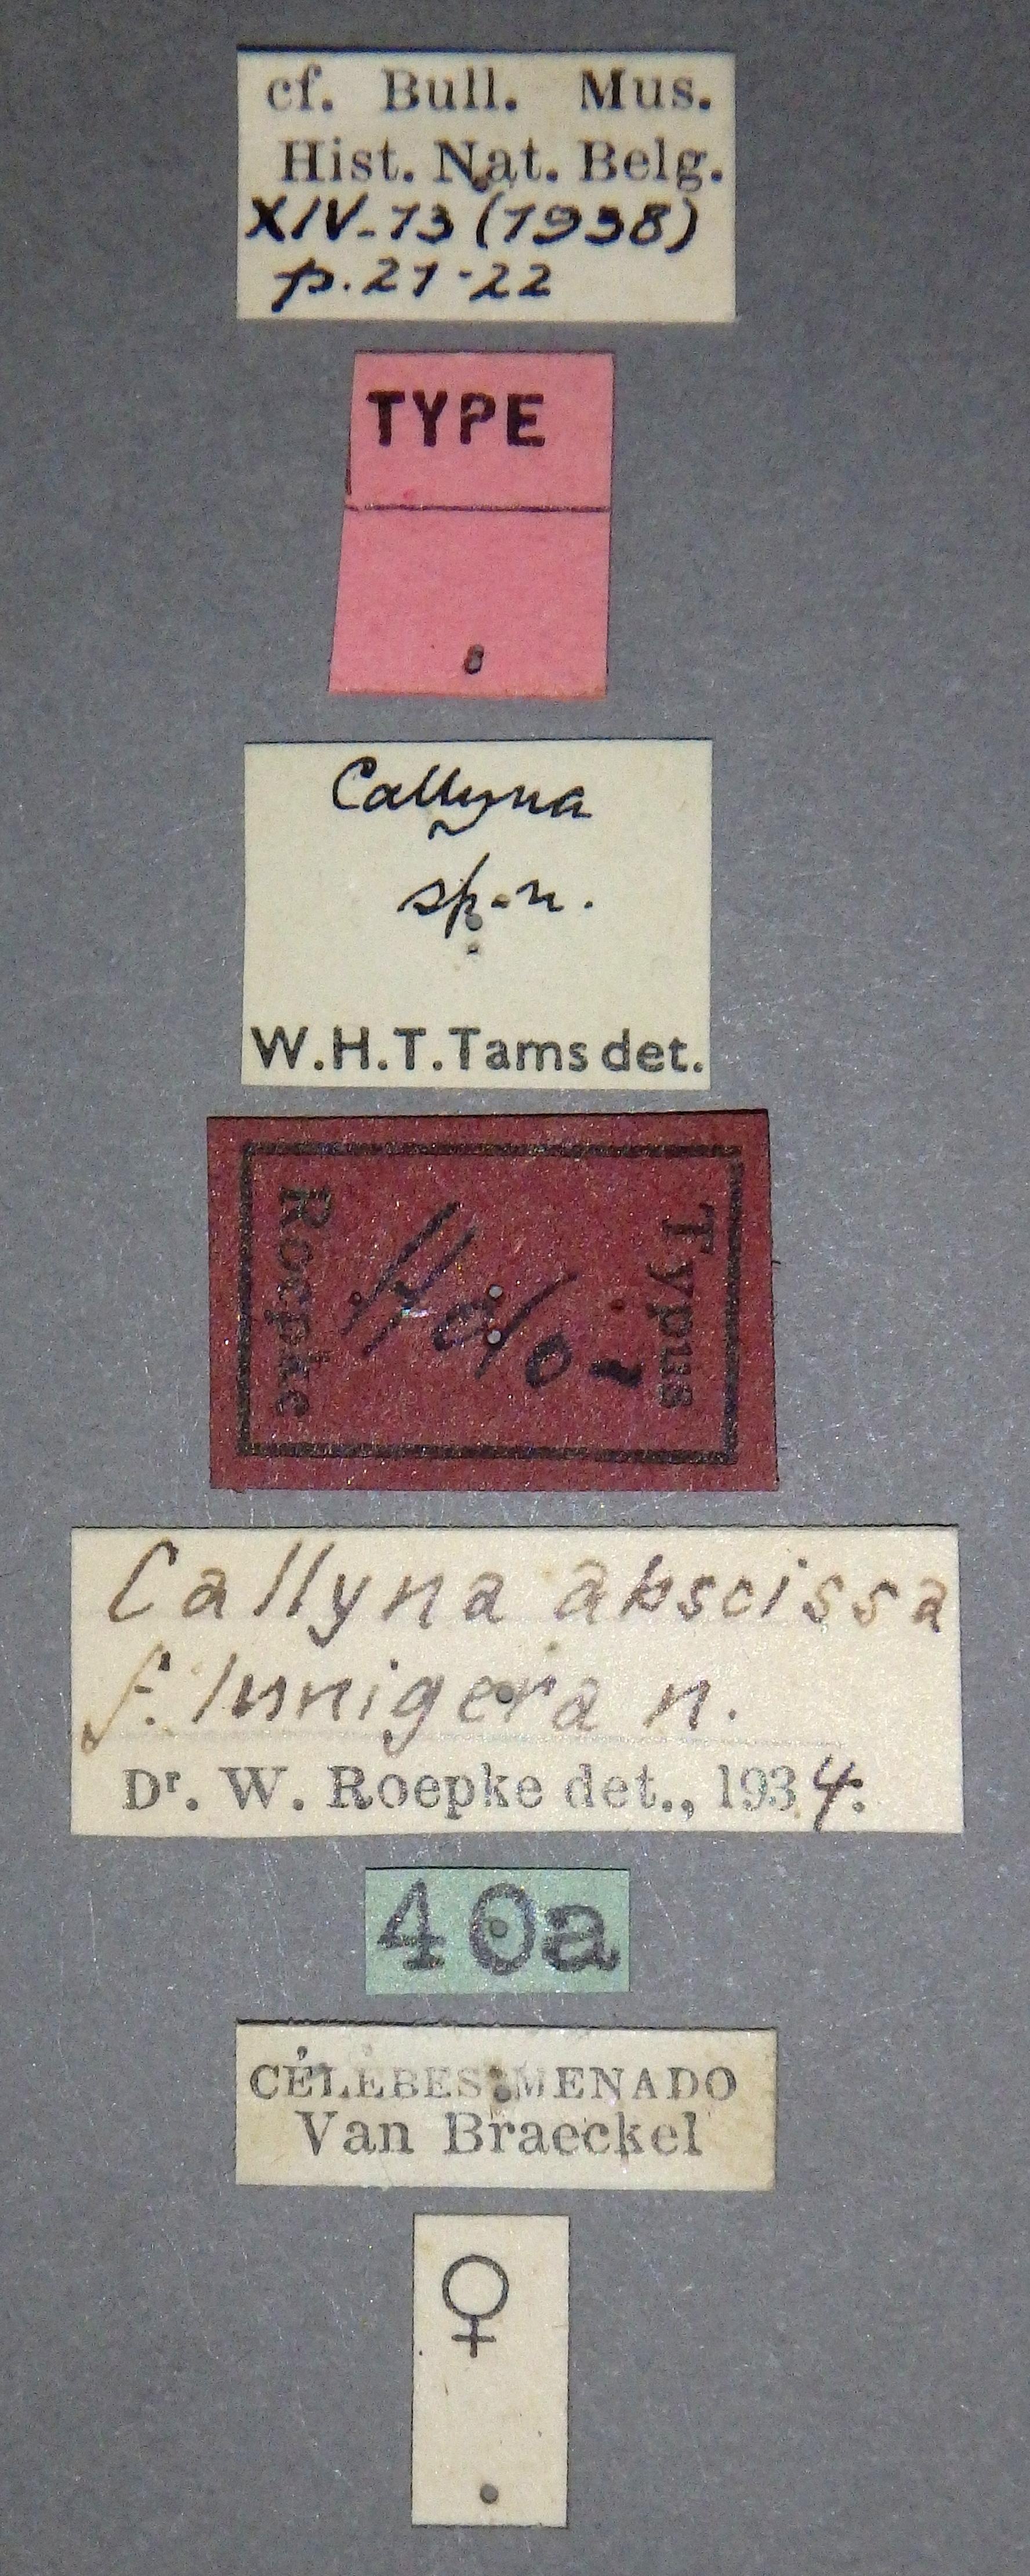 Callyna abscissa f. lunigera ht Lb.JPG